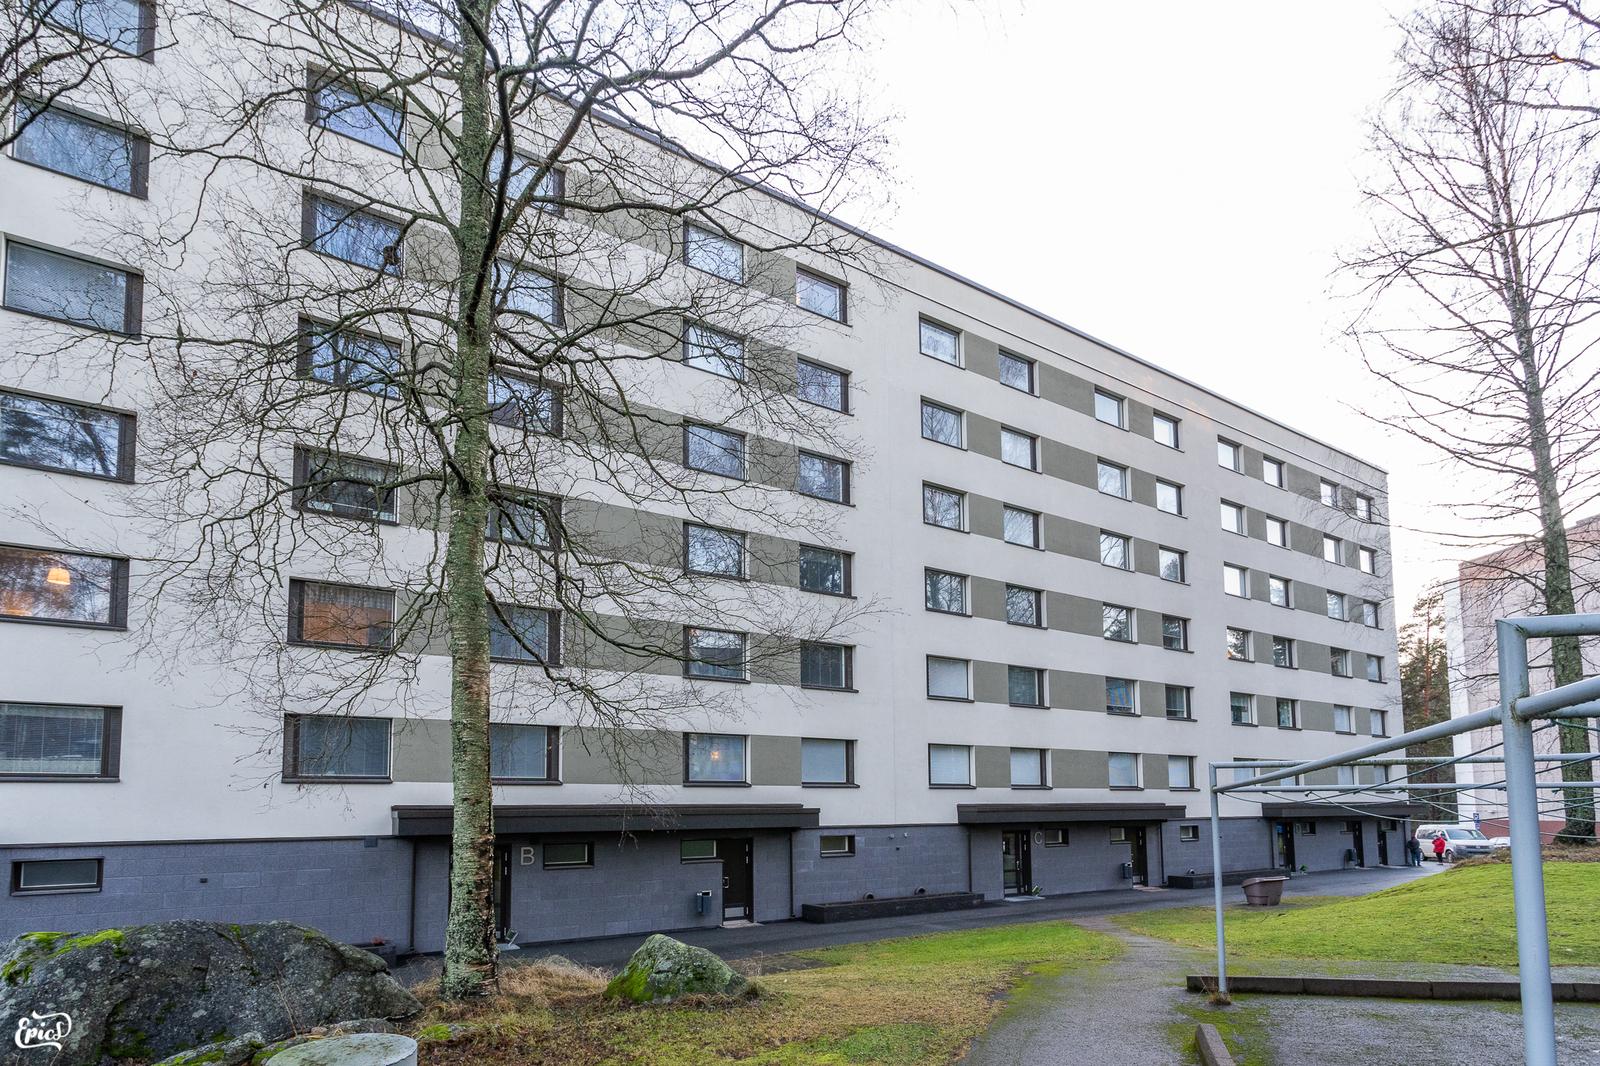 Kalkku, Tampere